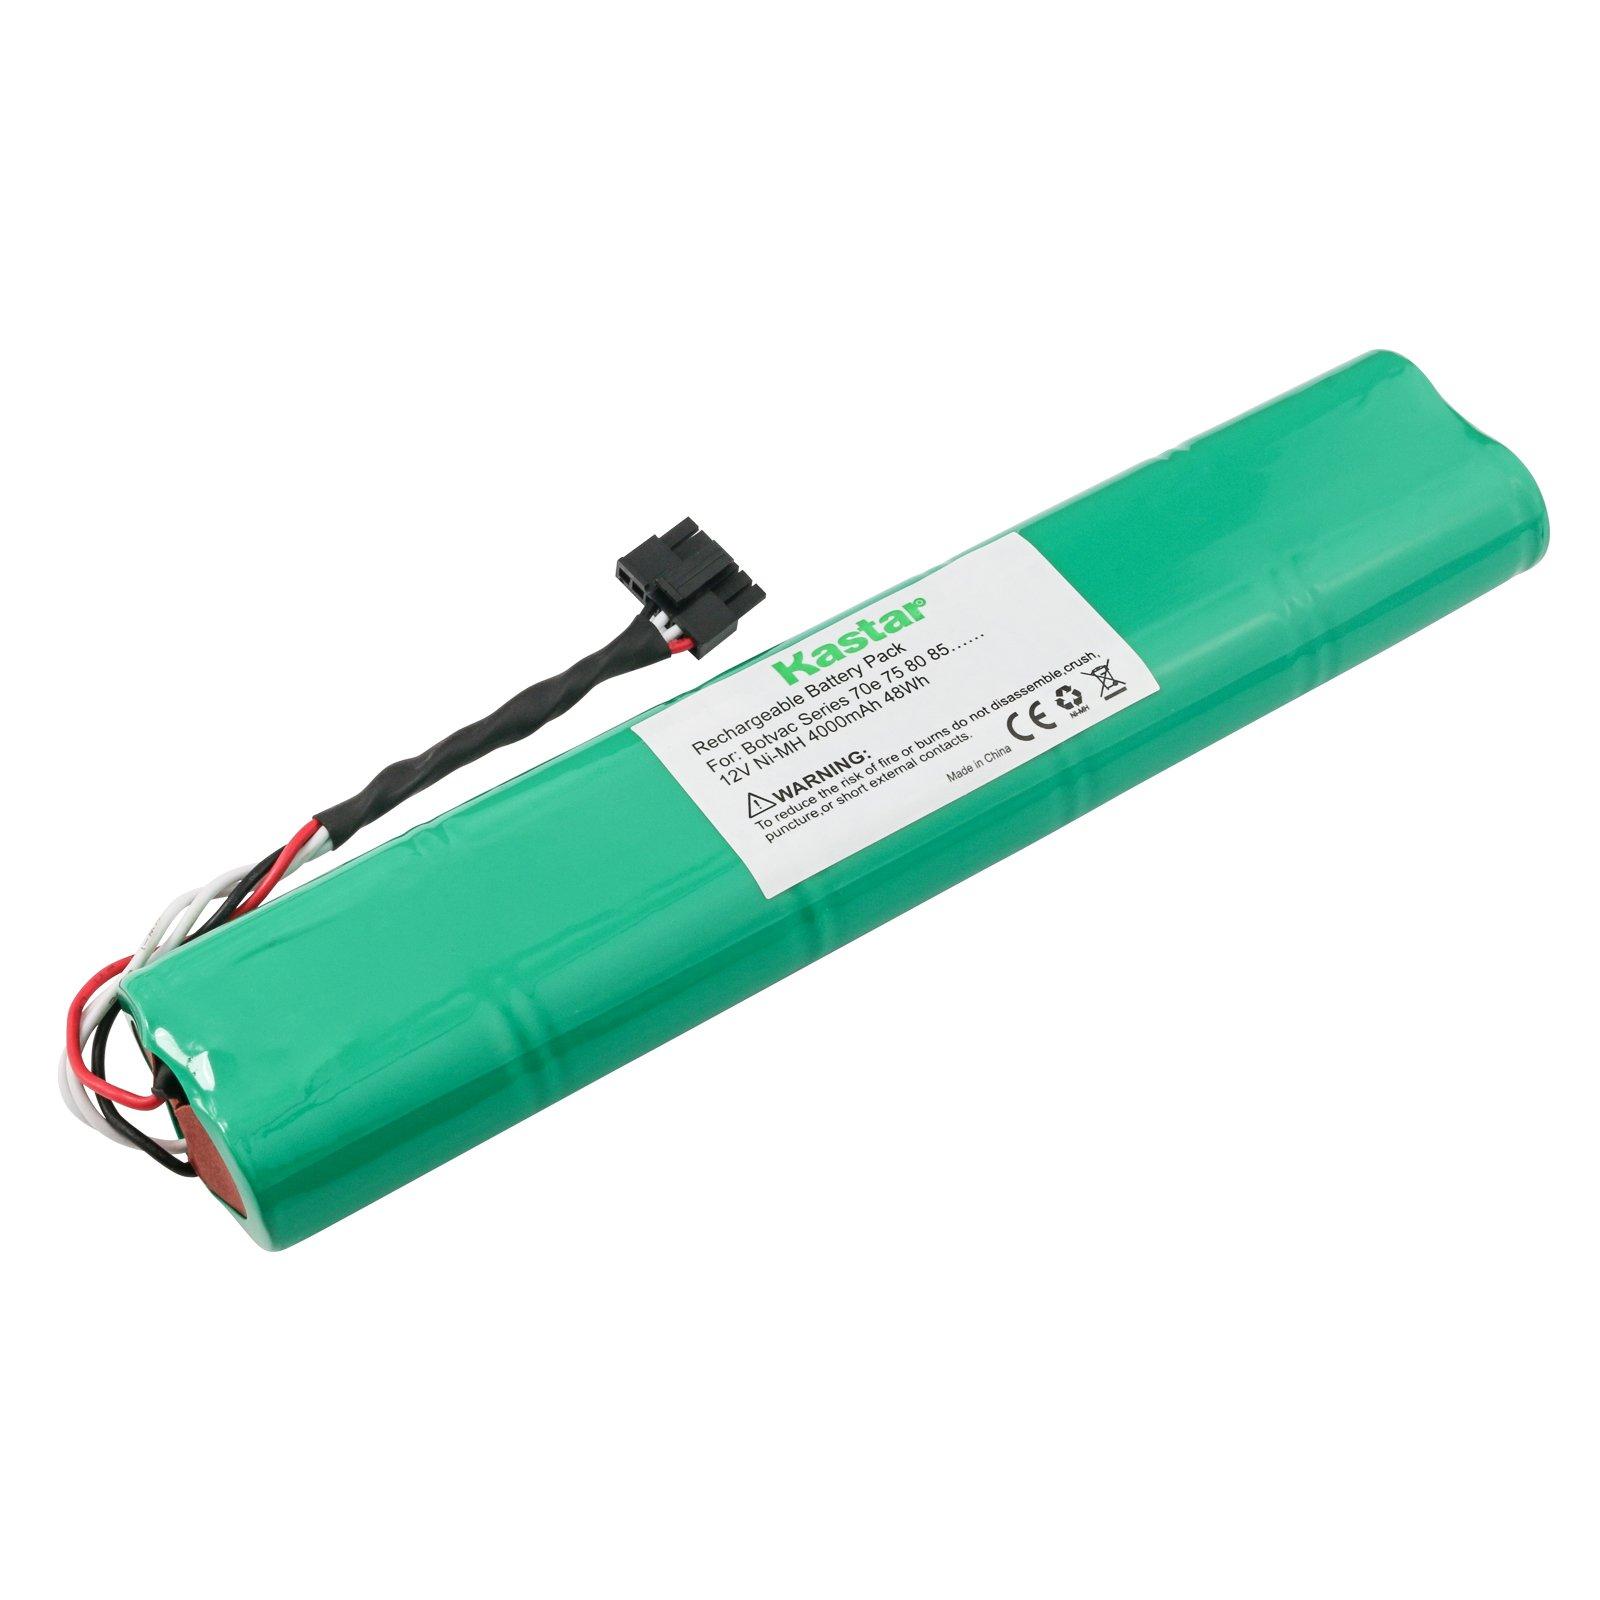 Kastar BOTVAC70e Battery (1 Pack), Ni-MH 12V 4000mAh, Replacement for Neato Botvac Series and Botvac D Series Robots Botvac 70e, 75, 80, 85 Robotic Vacuum Cleaner 945-0129 945-0174